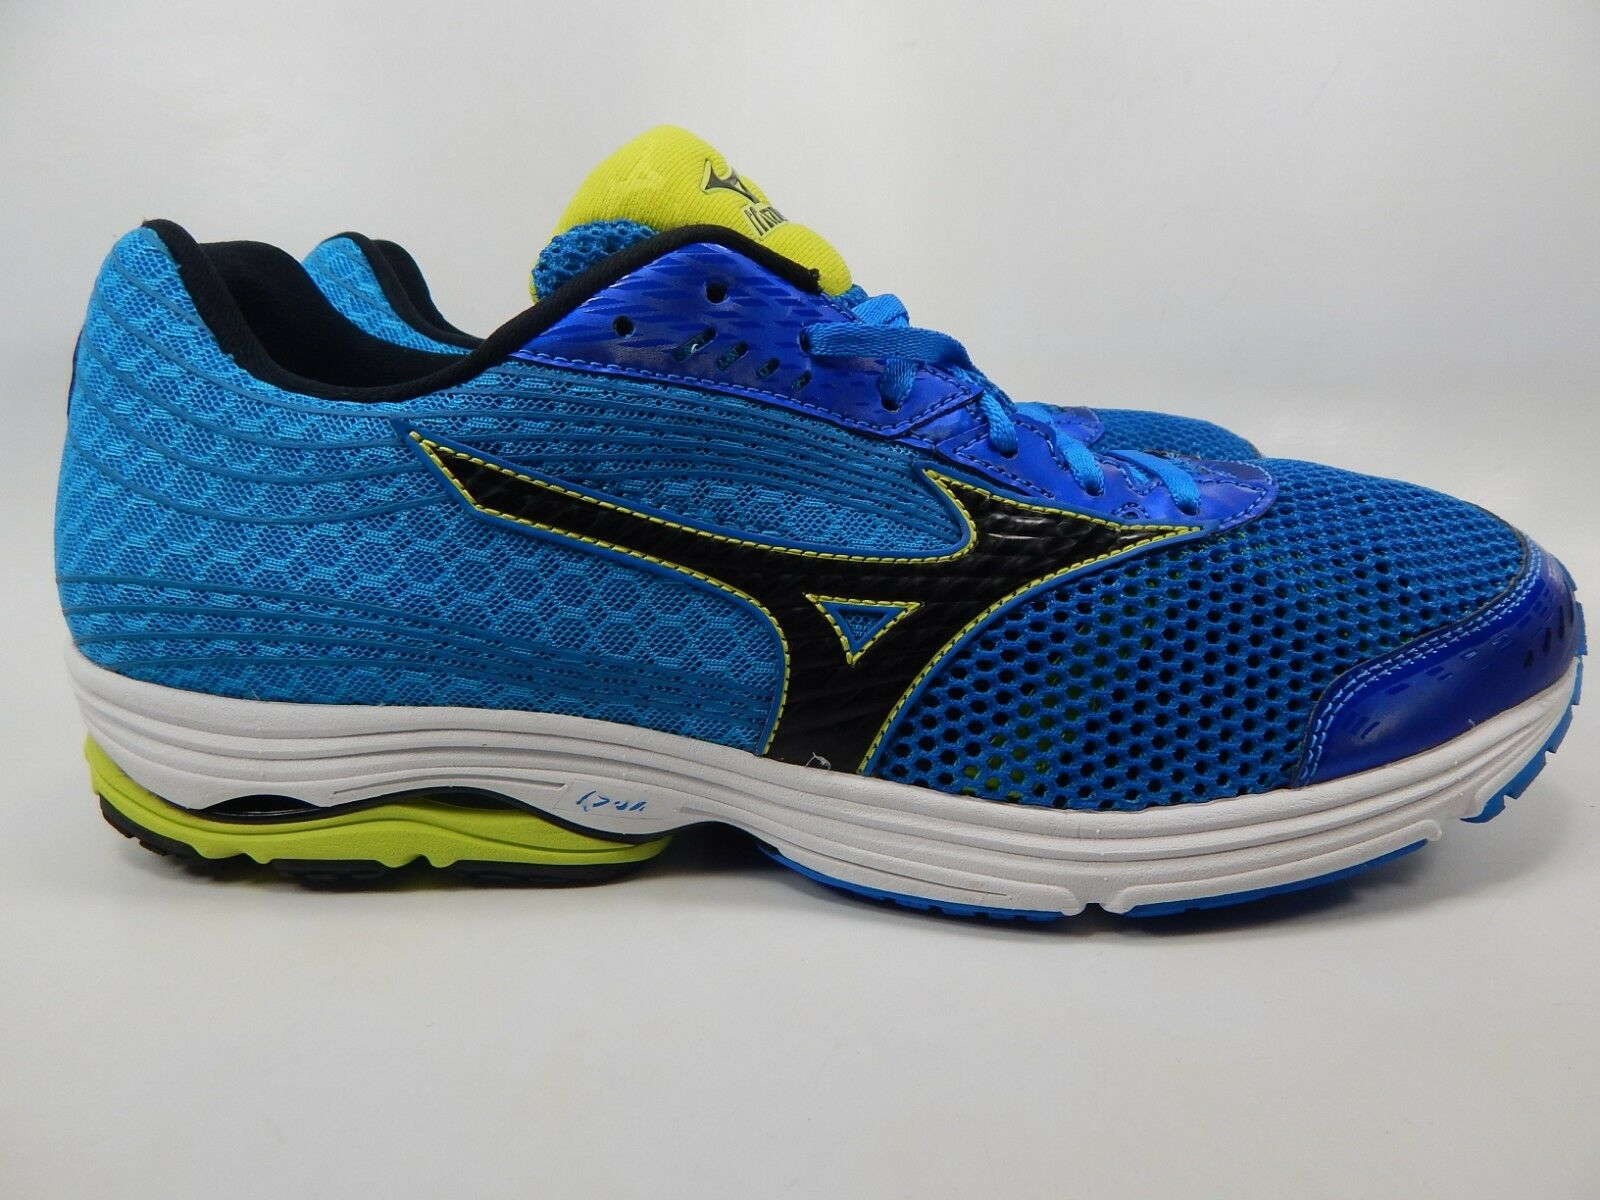 Wave Sayonara 3 Size US 14 M (D) EU 48.5 Men's Running shoes bluee Green